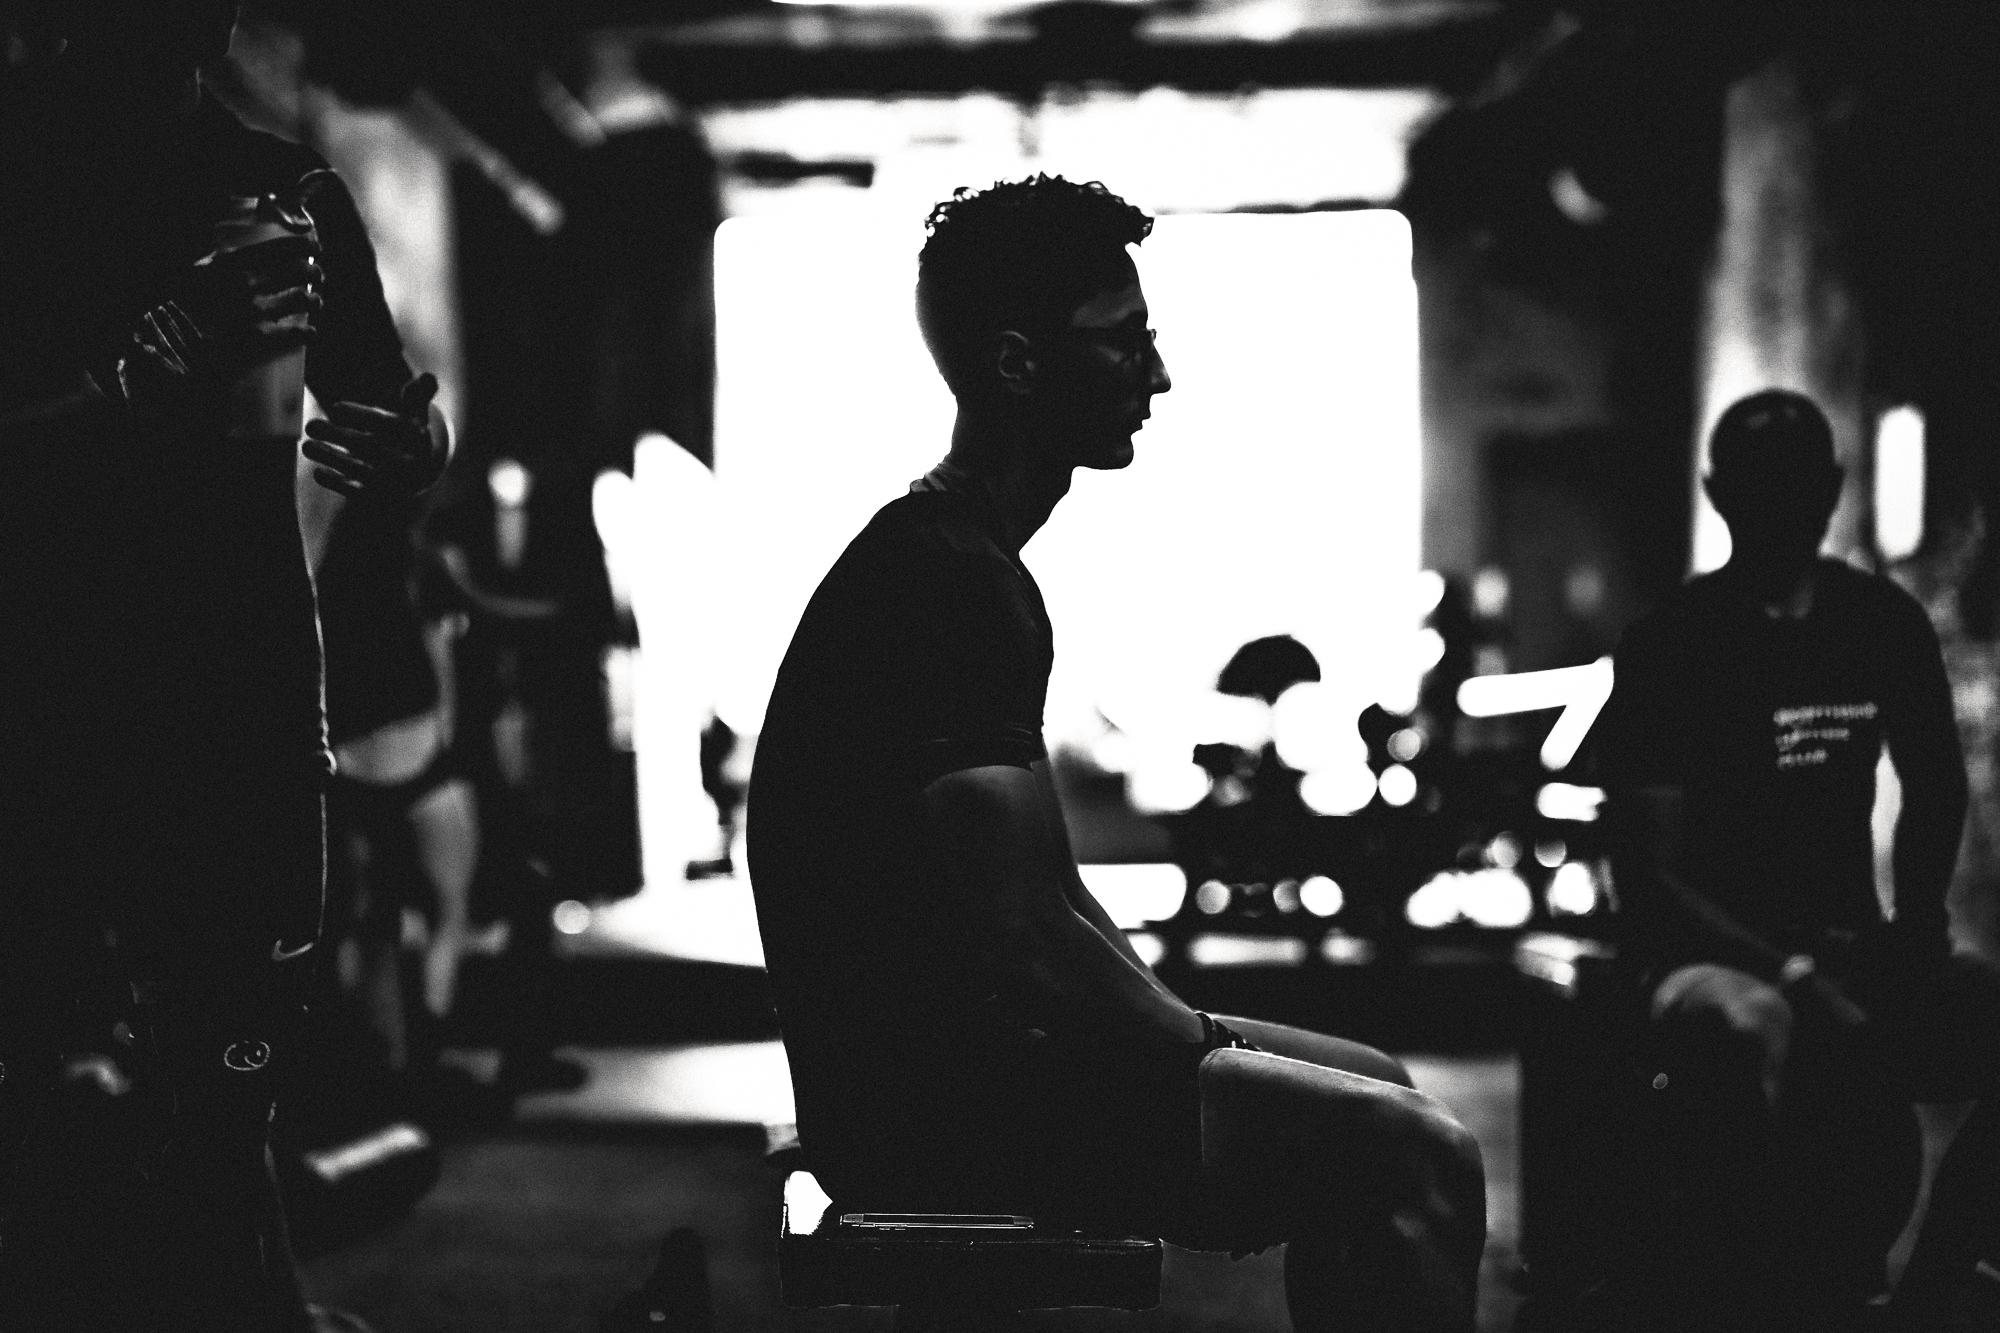 Weightlifter: James